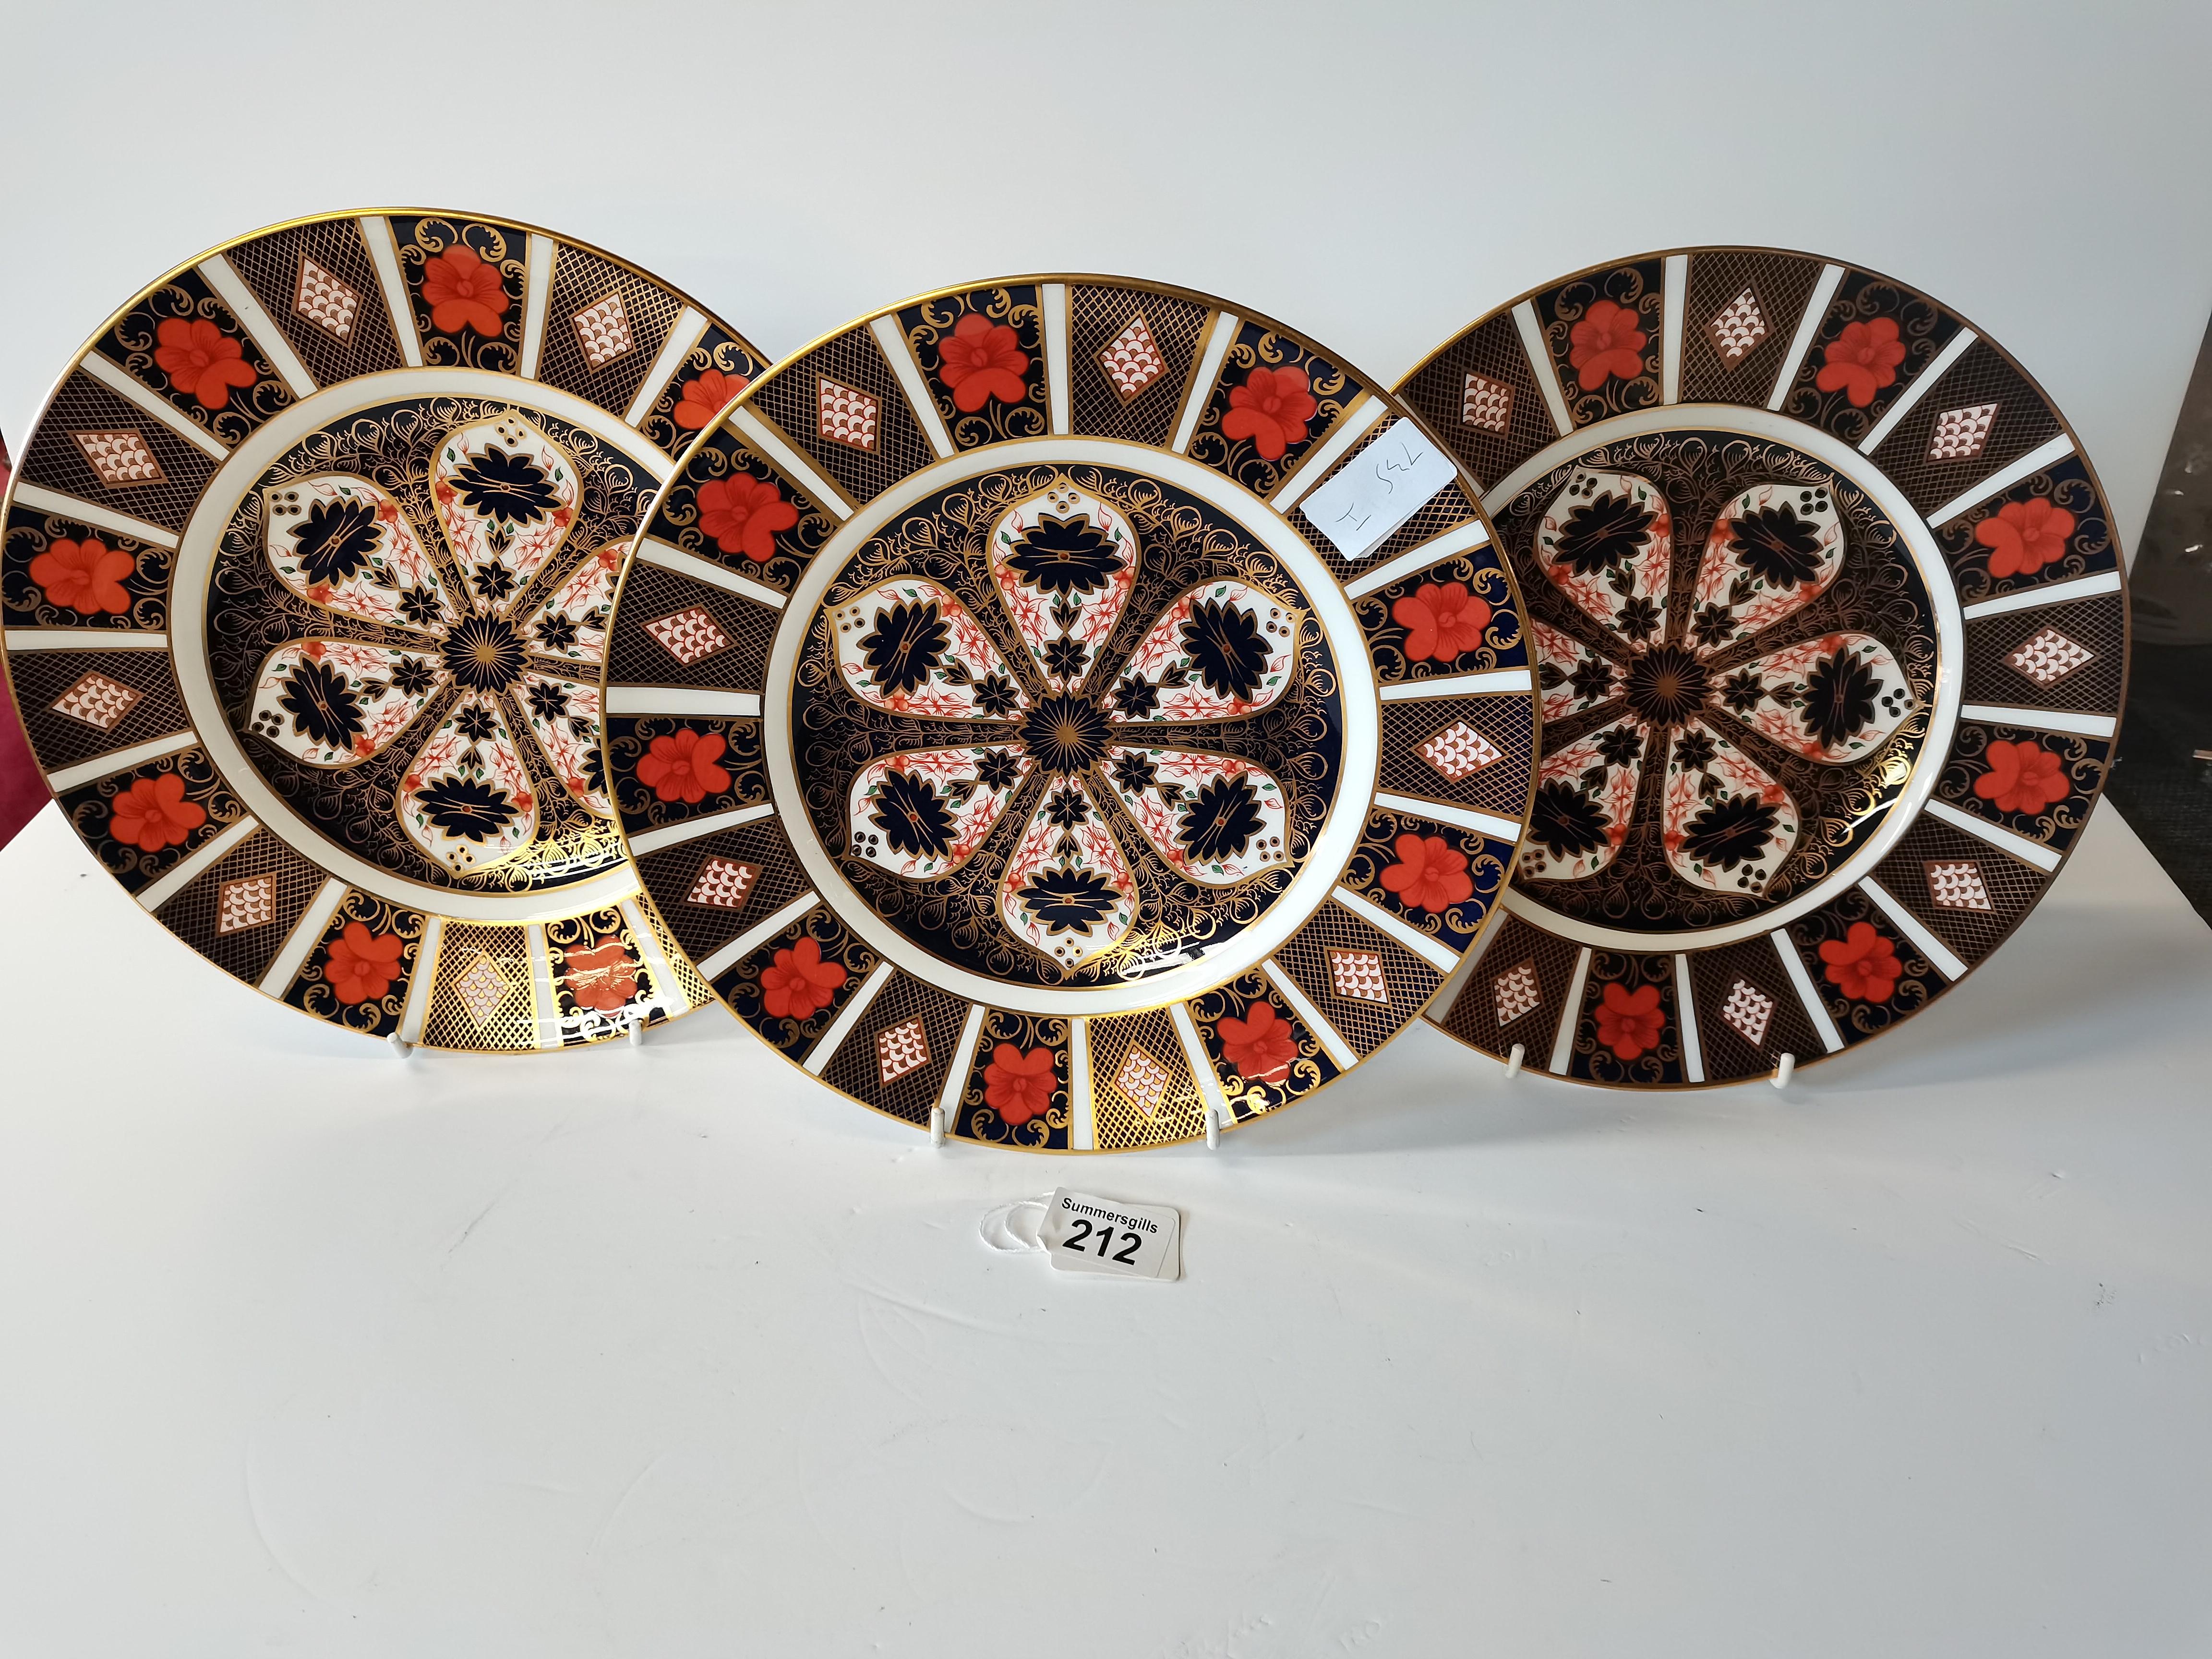 3 Royal Crown Derby Imari Pattern 1128 Dinner Plates 27cm